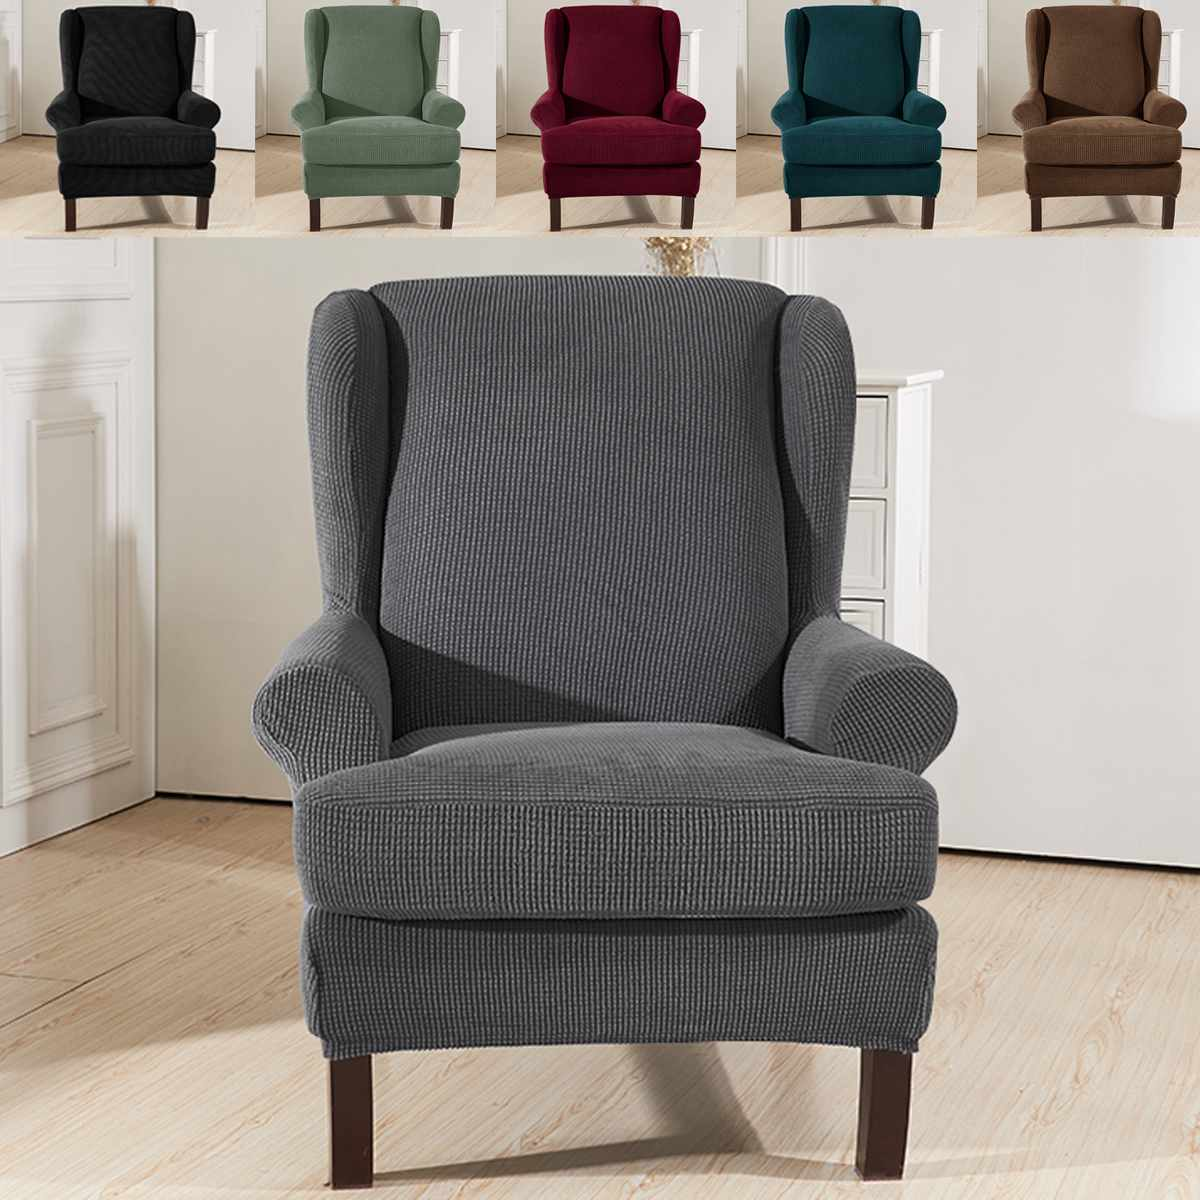 Elastic Armchair Wingback Wing Sofa Back Chair Cover Sloping Arm King Back  Chair Cover Stretch Protector SlipCover Protector Slipcovers Dining Room ...